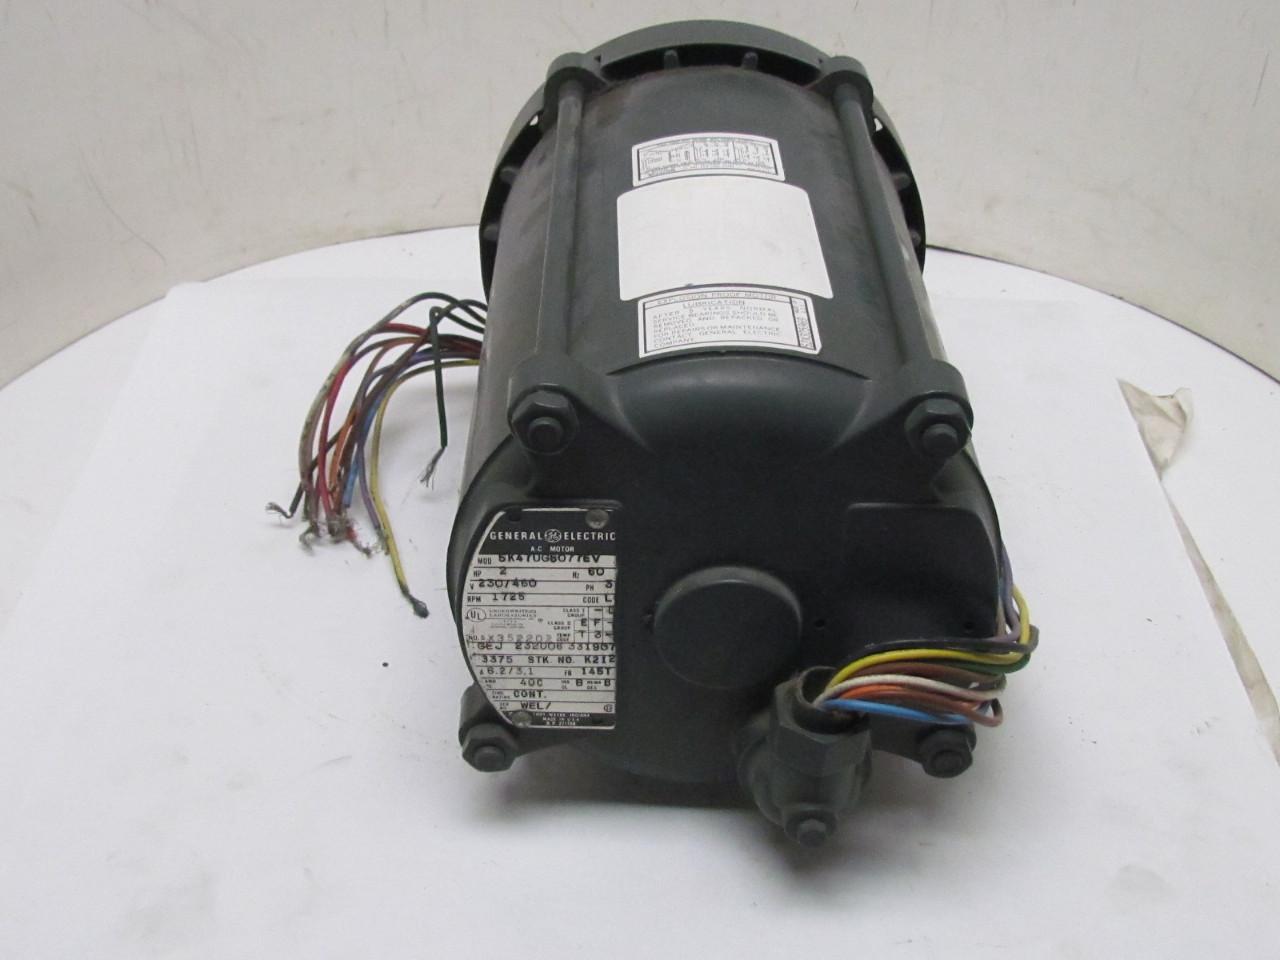 Ge general electric motor 2 hp 1725 rpm 3ph 230 460v 145t for Hazardous location motor starter